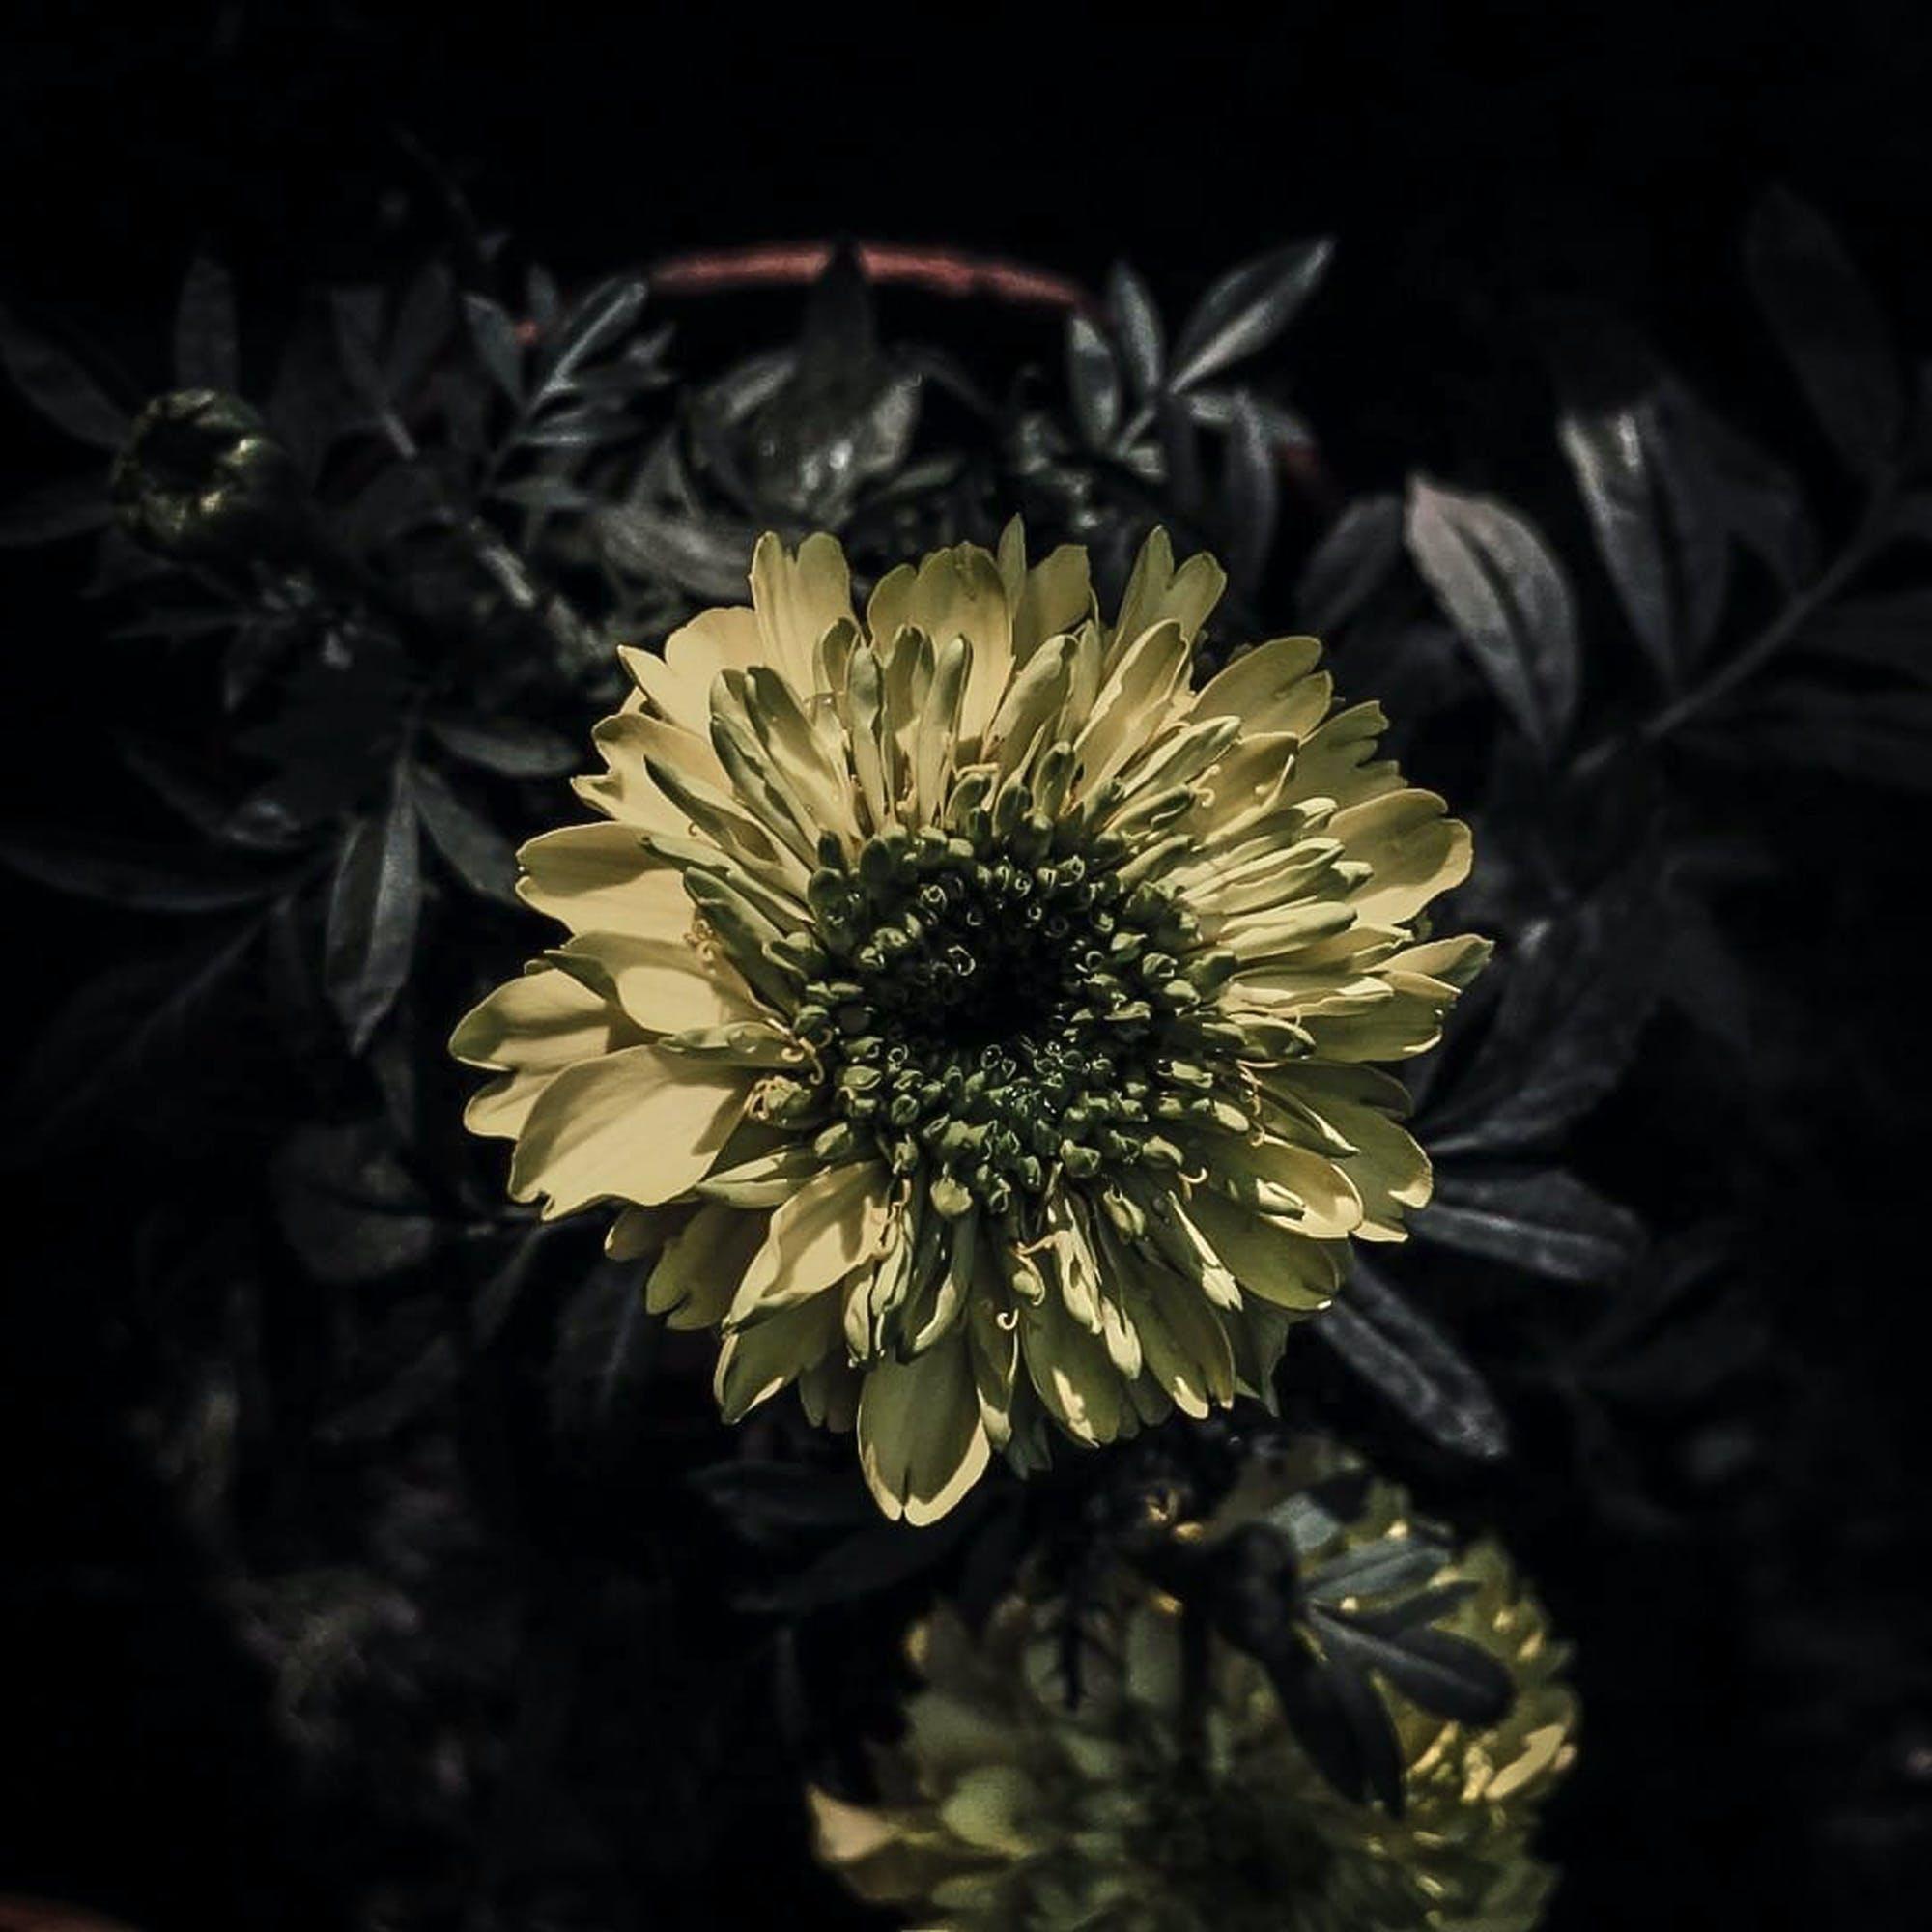 Безкоштовне стокове фото на тему «#beauty, #flowers, #nature, #outdoorchallenge»